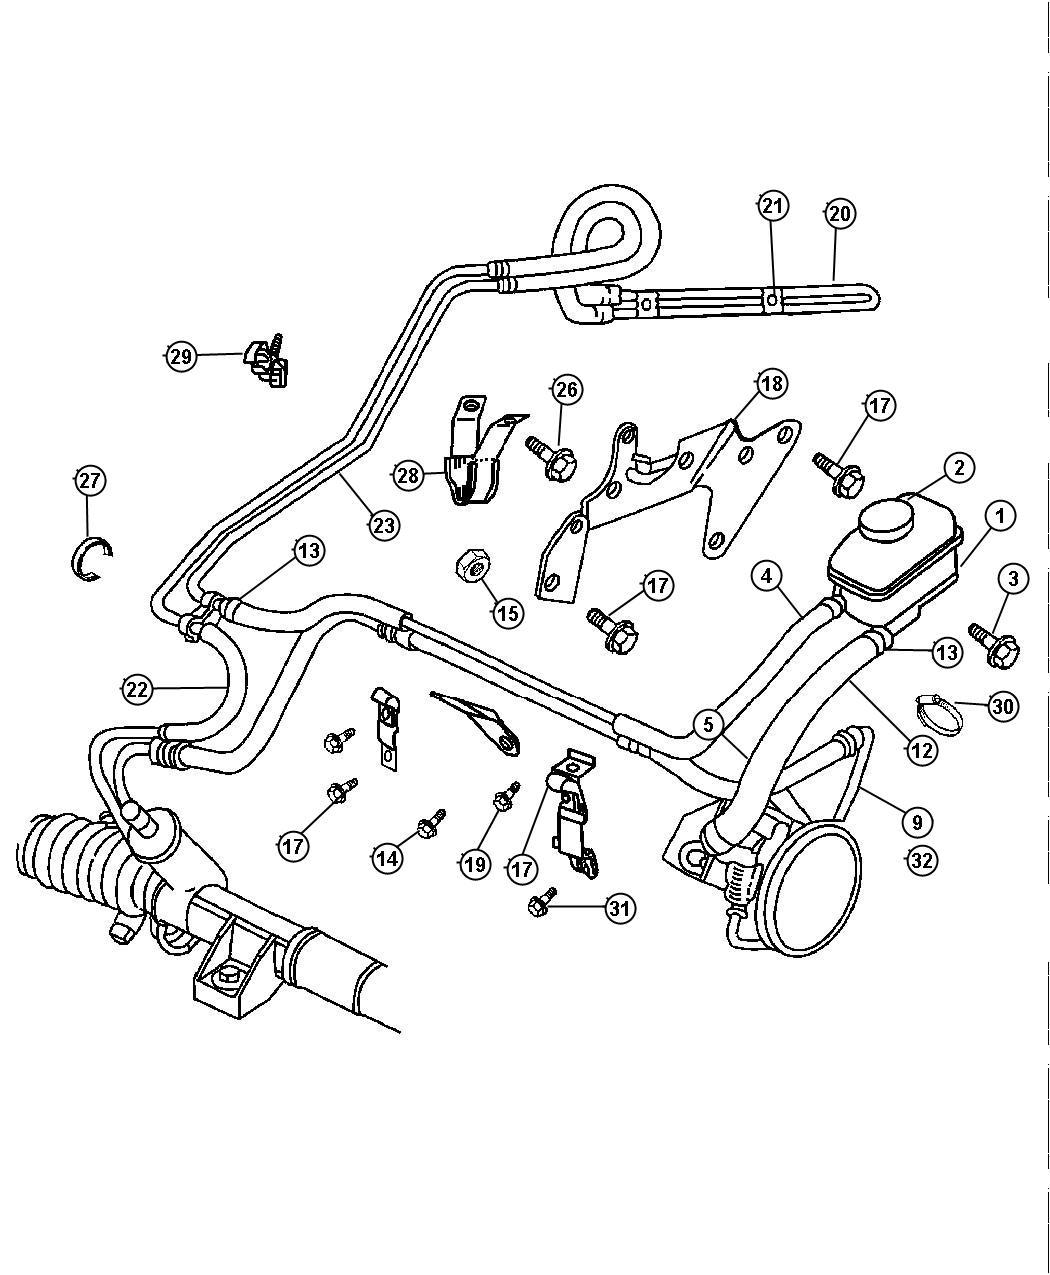 fuse box diagram 1999 mercury sable dohc  mercury  auto